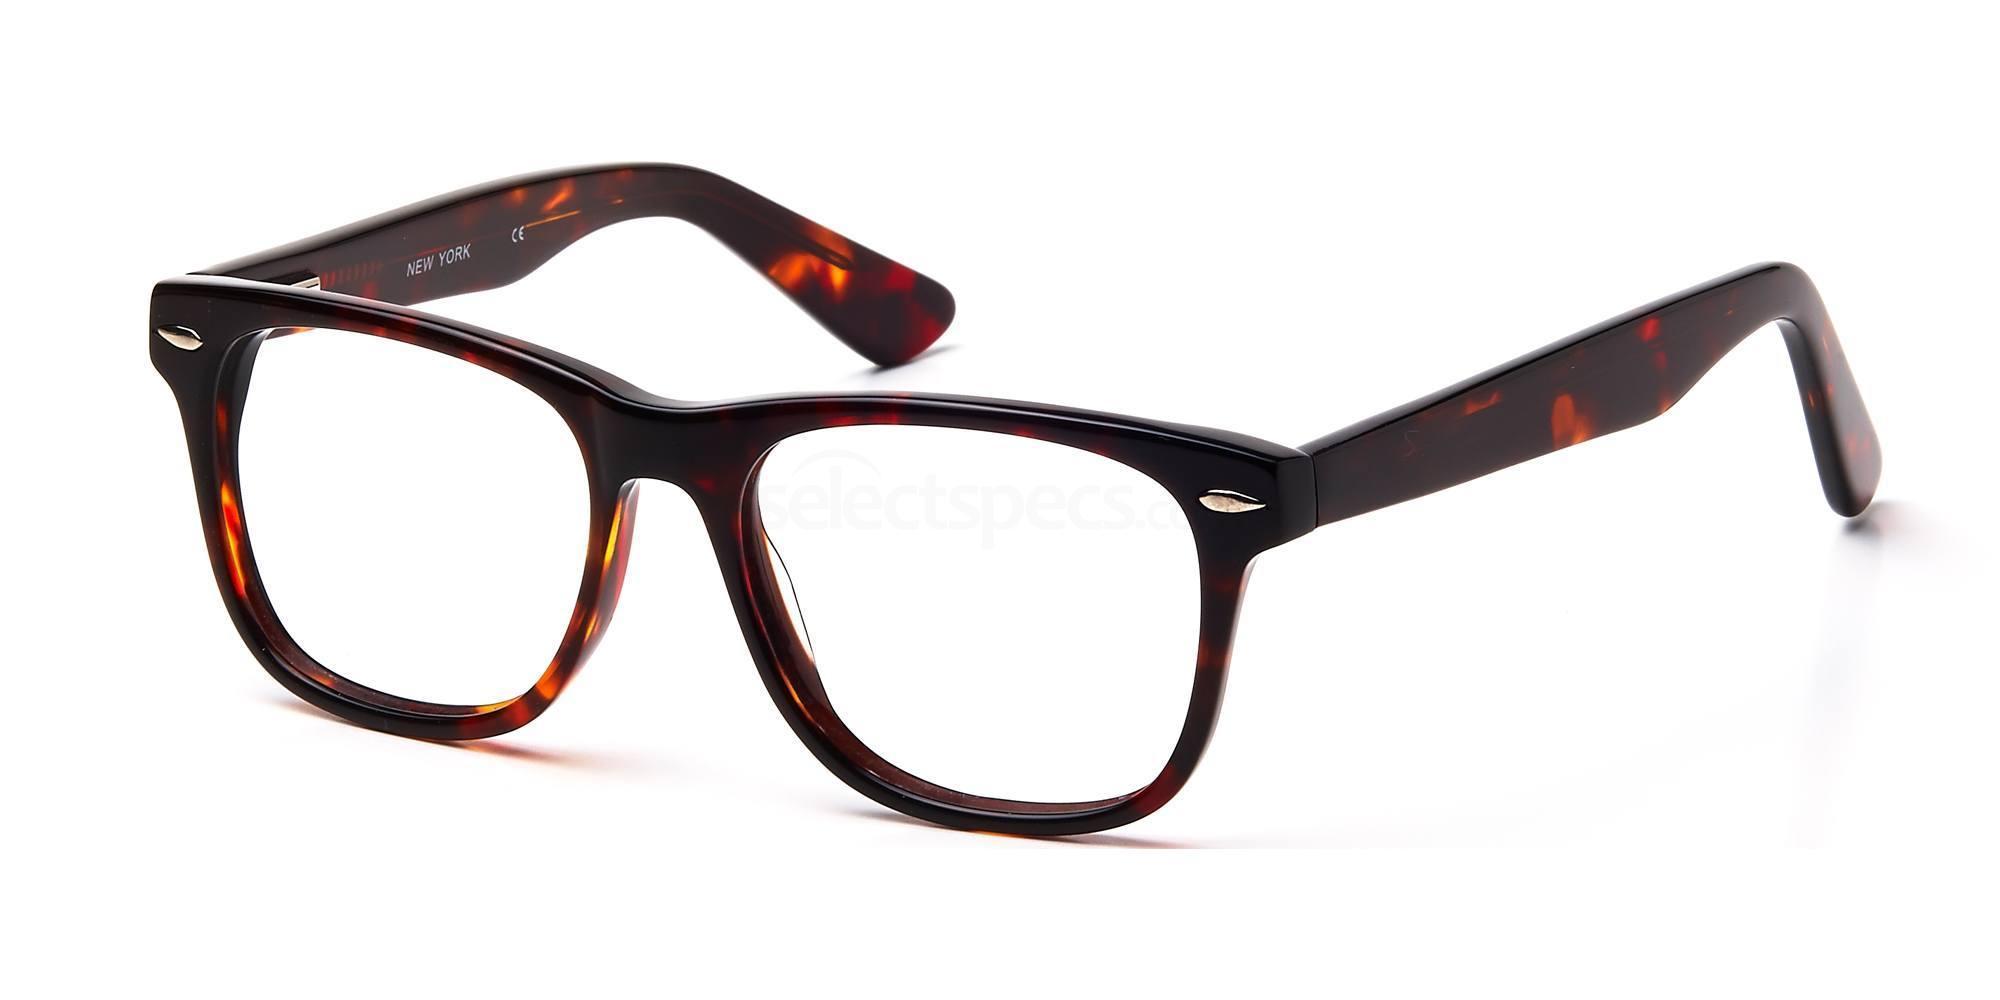 C3 NEWYORK Glasses, Top Secret KIDS